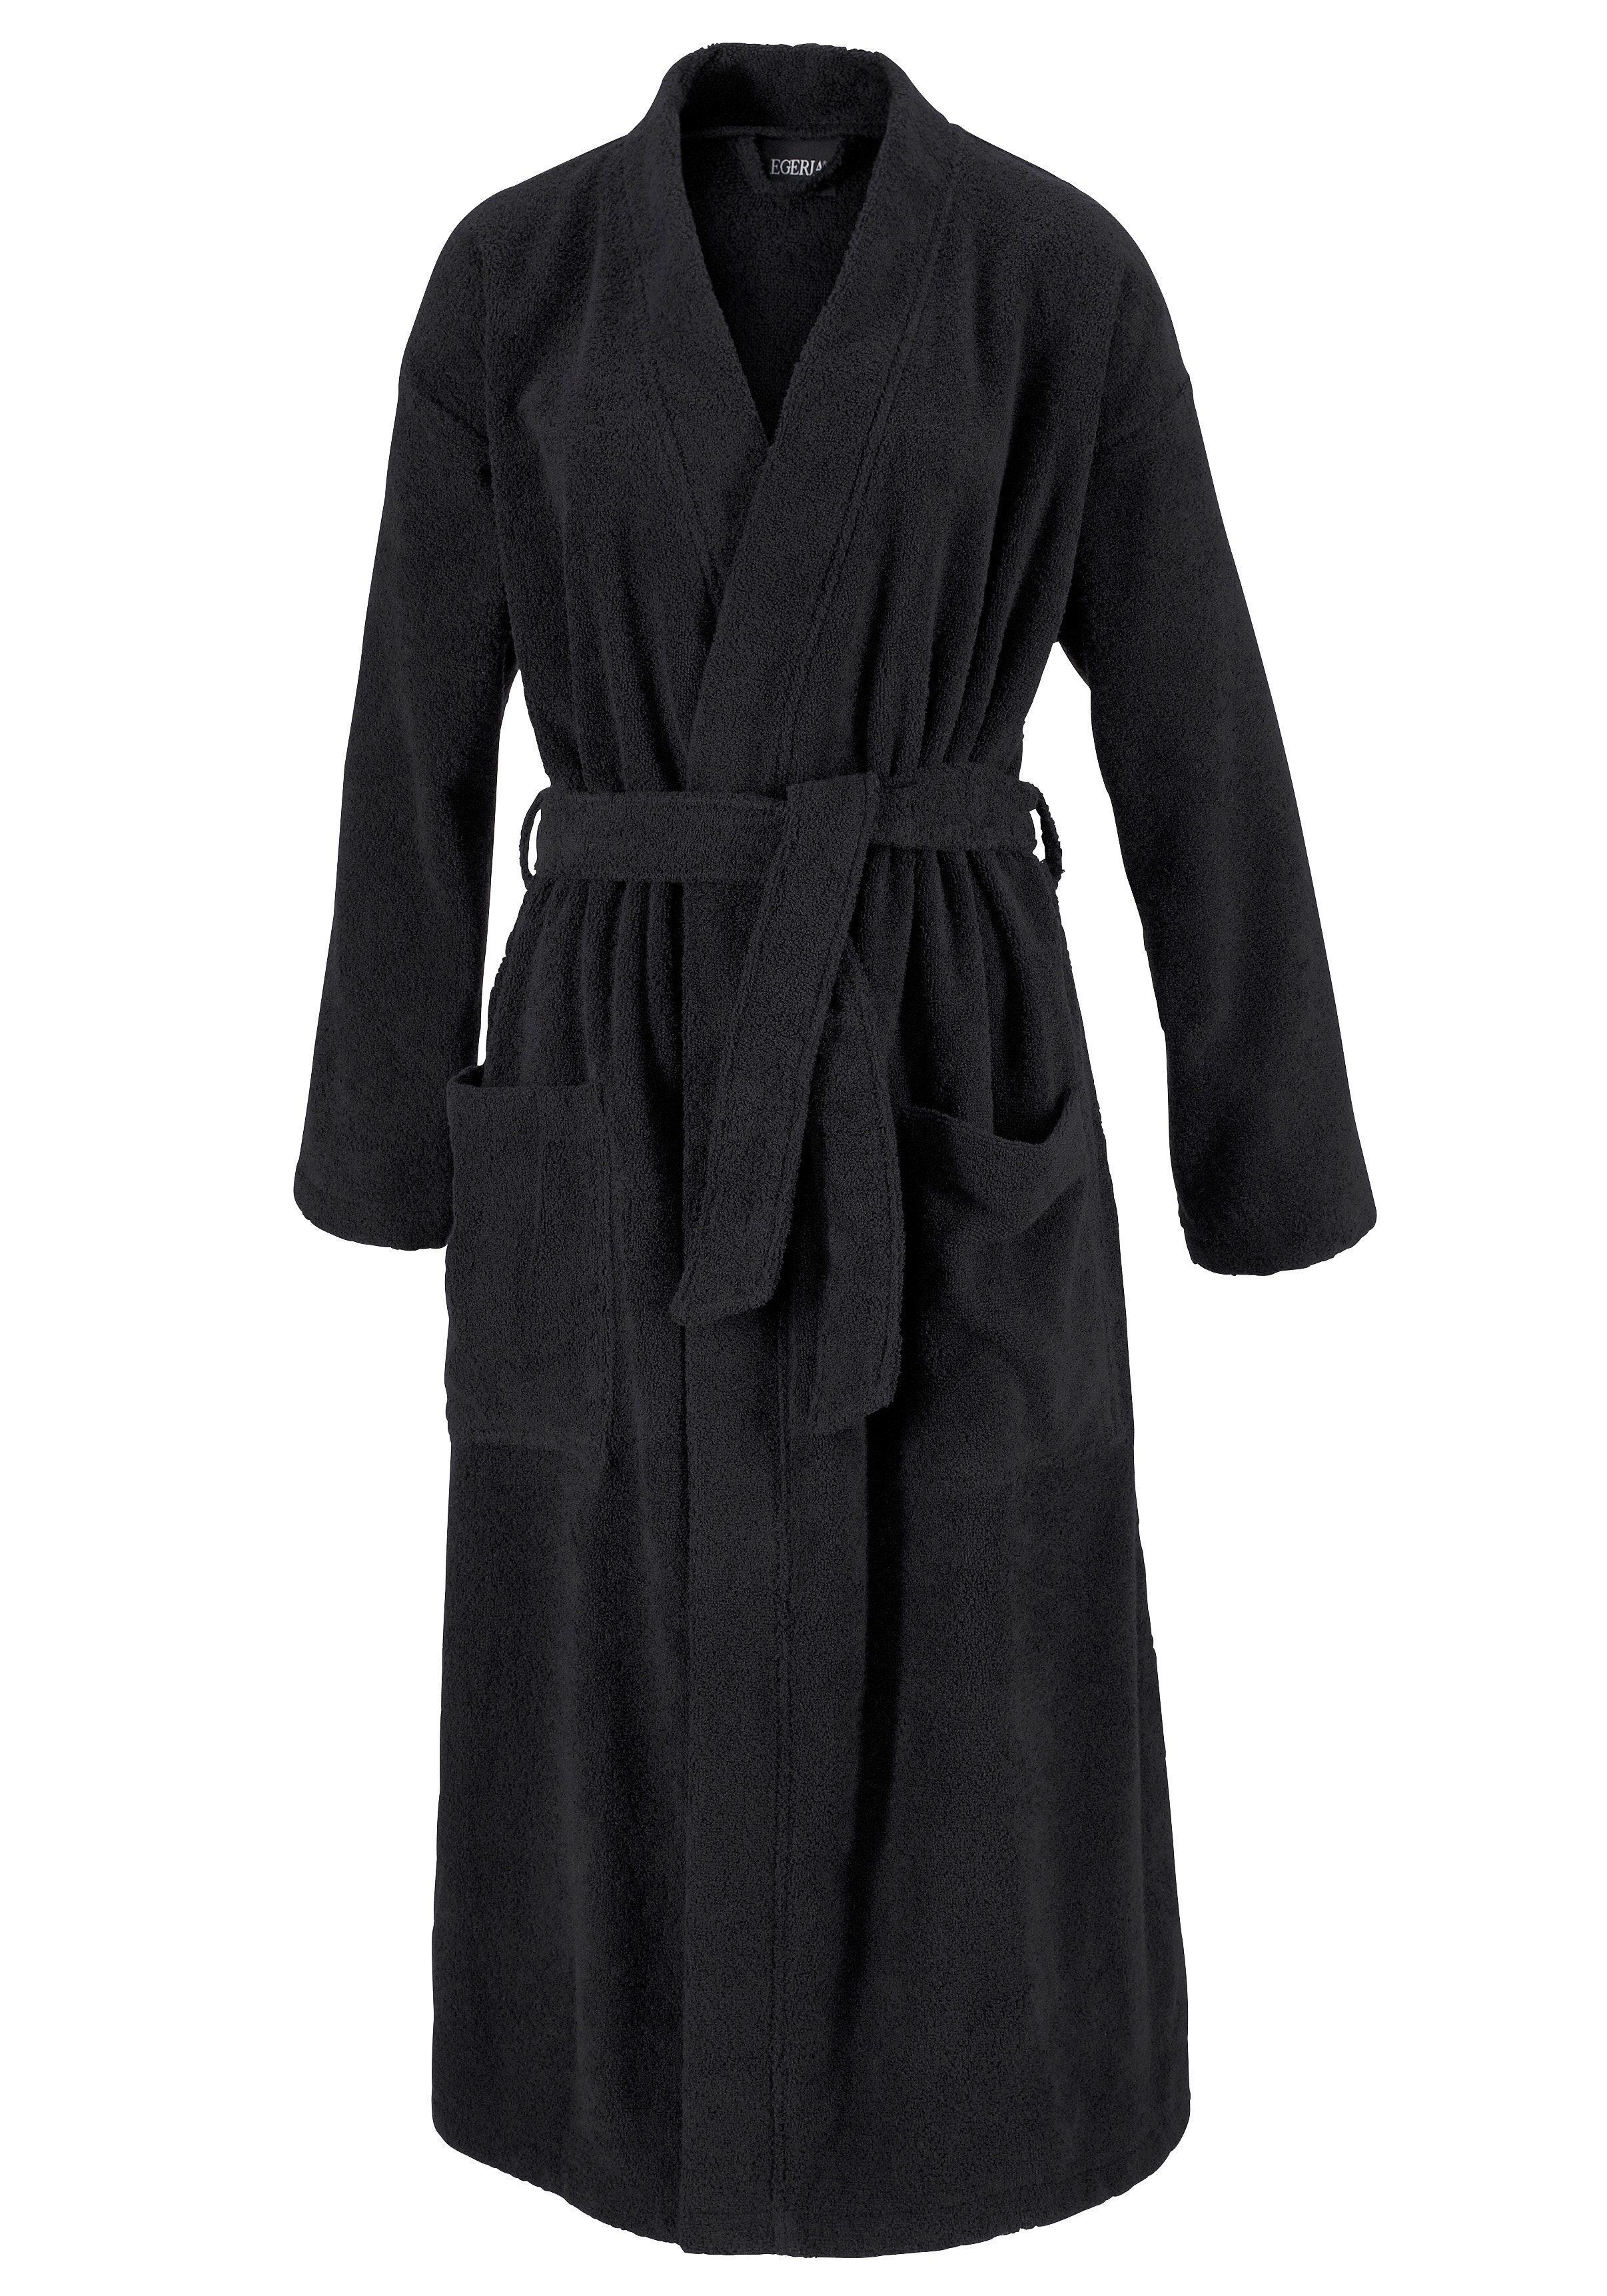 Unisex-Bademantel, Egeria, »Topas«, in Kimonoform | Bekleidung > Bademode > Bademäntel | Schwarz | Baumwolle | EGERIA